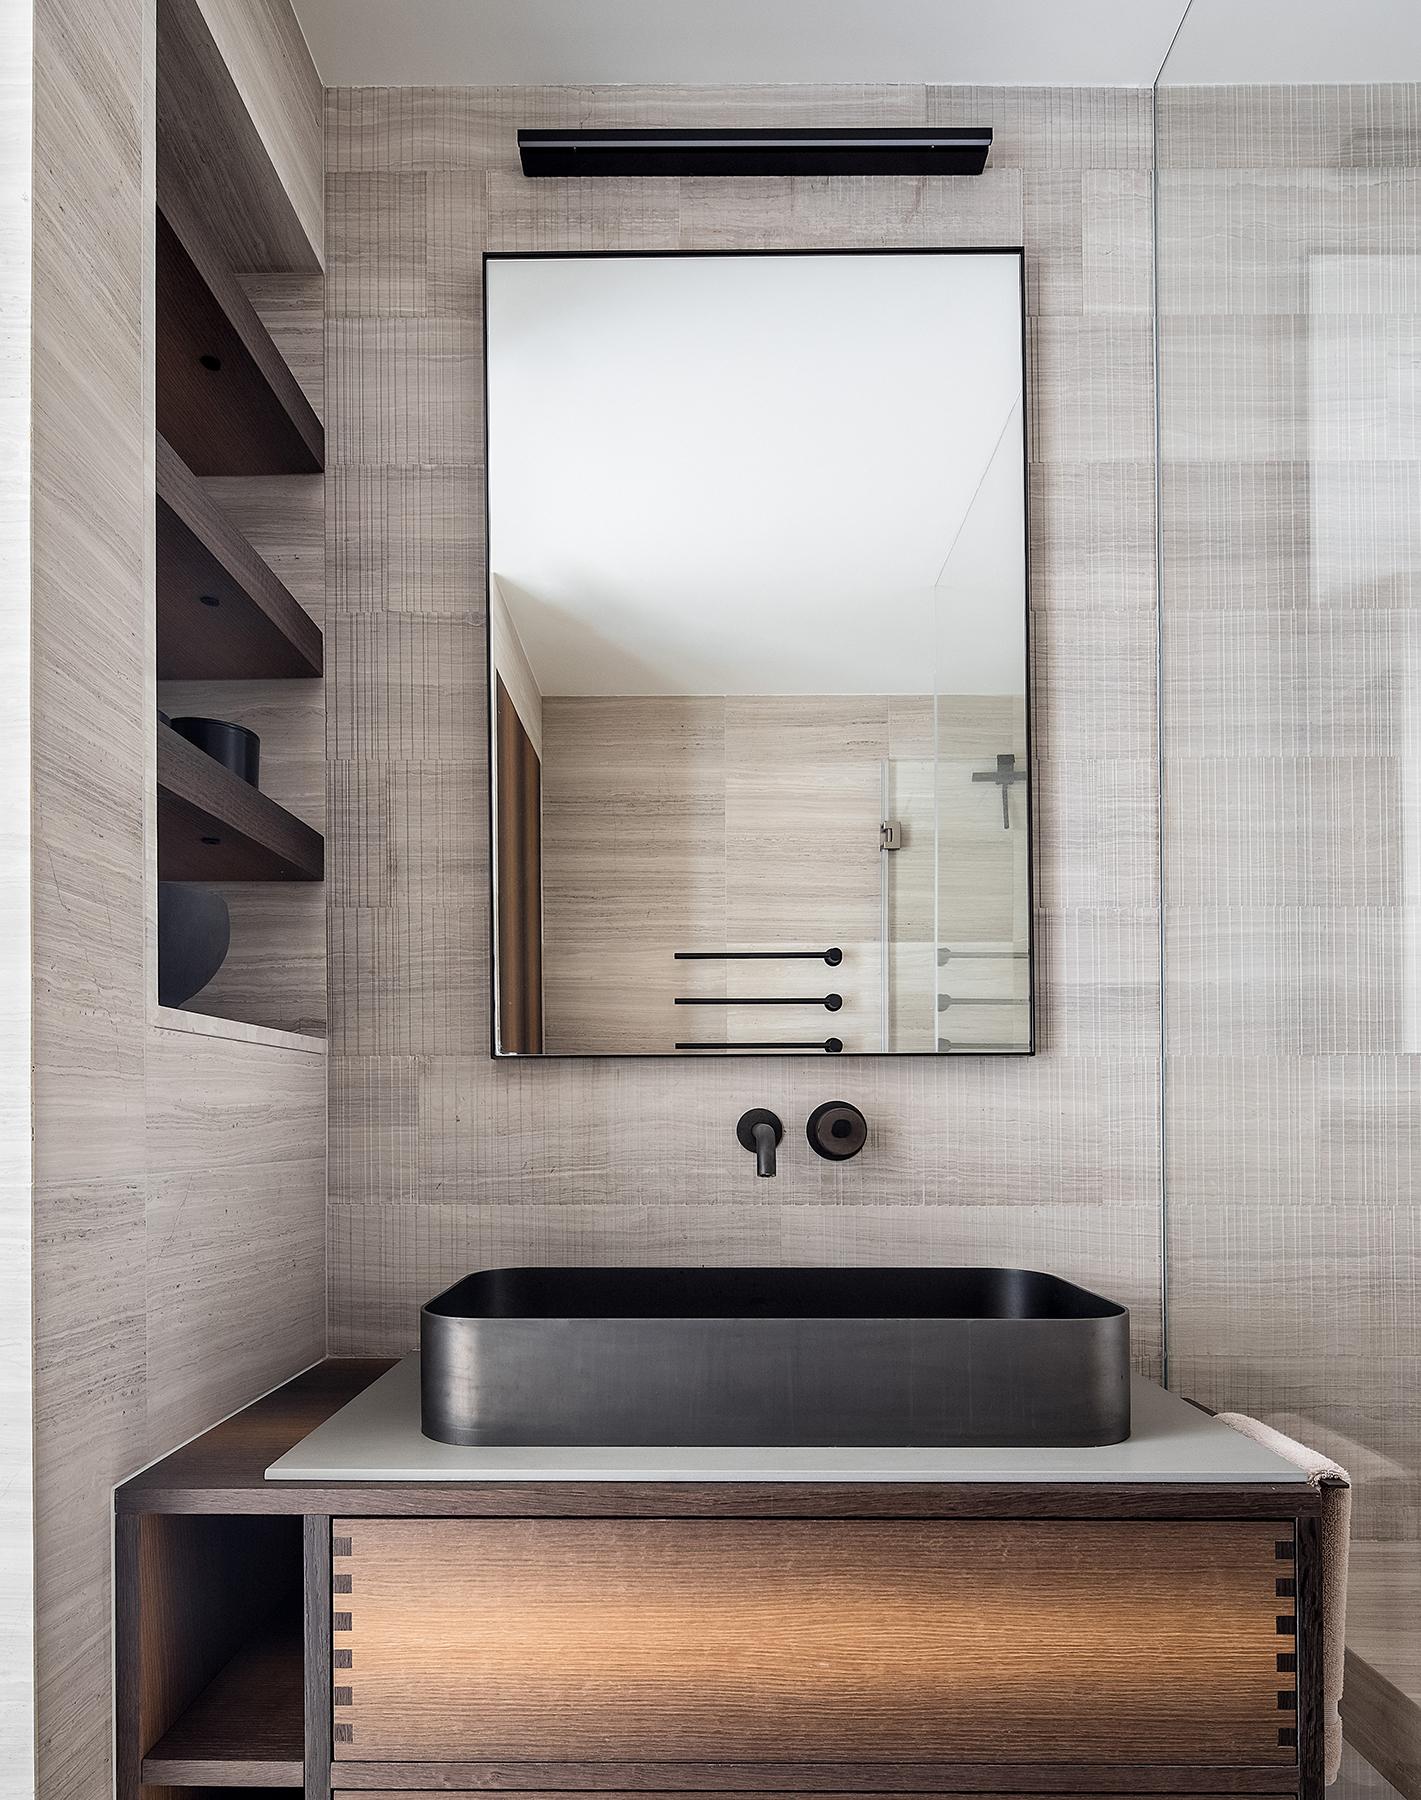 His_Master_Bathroom_Kensington_London_W8_40